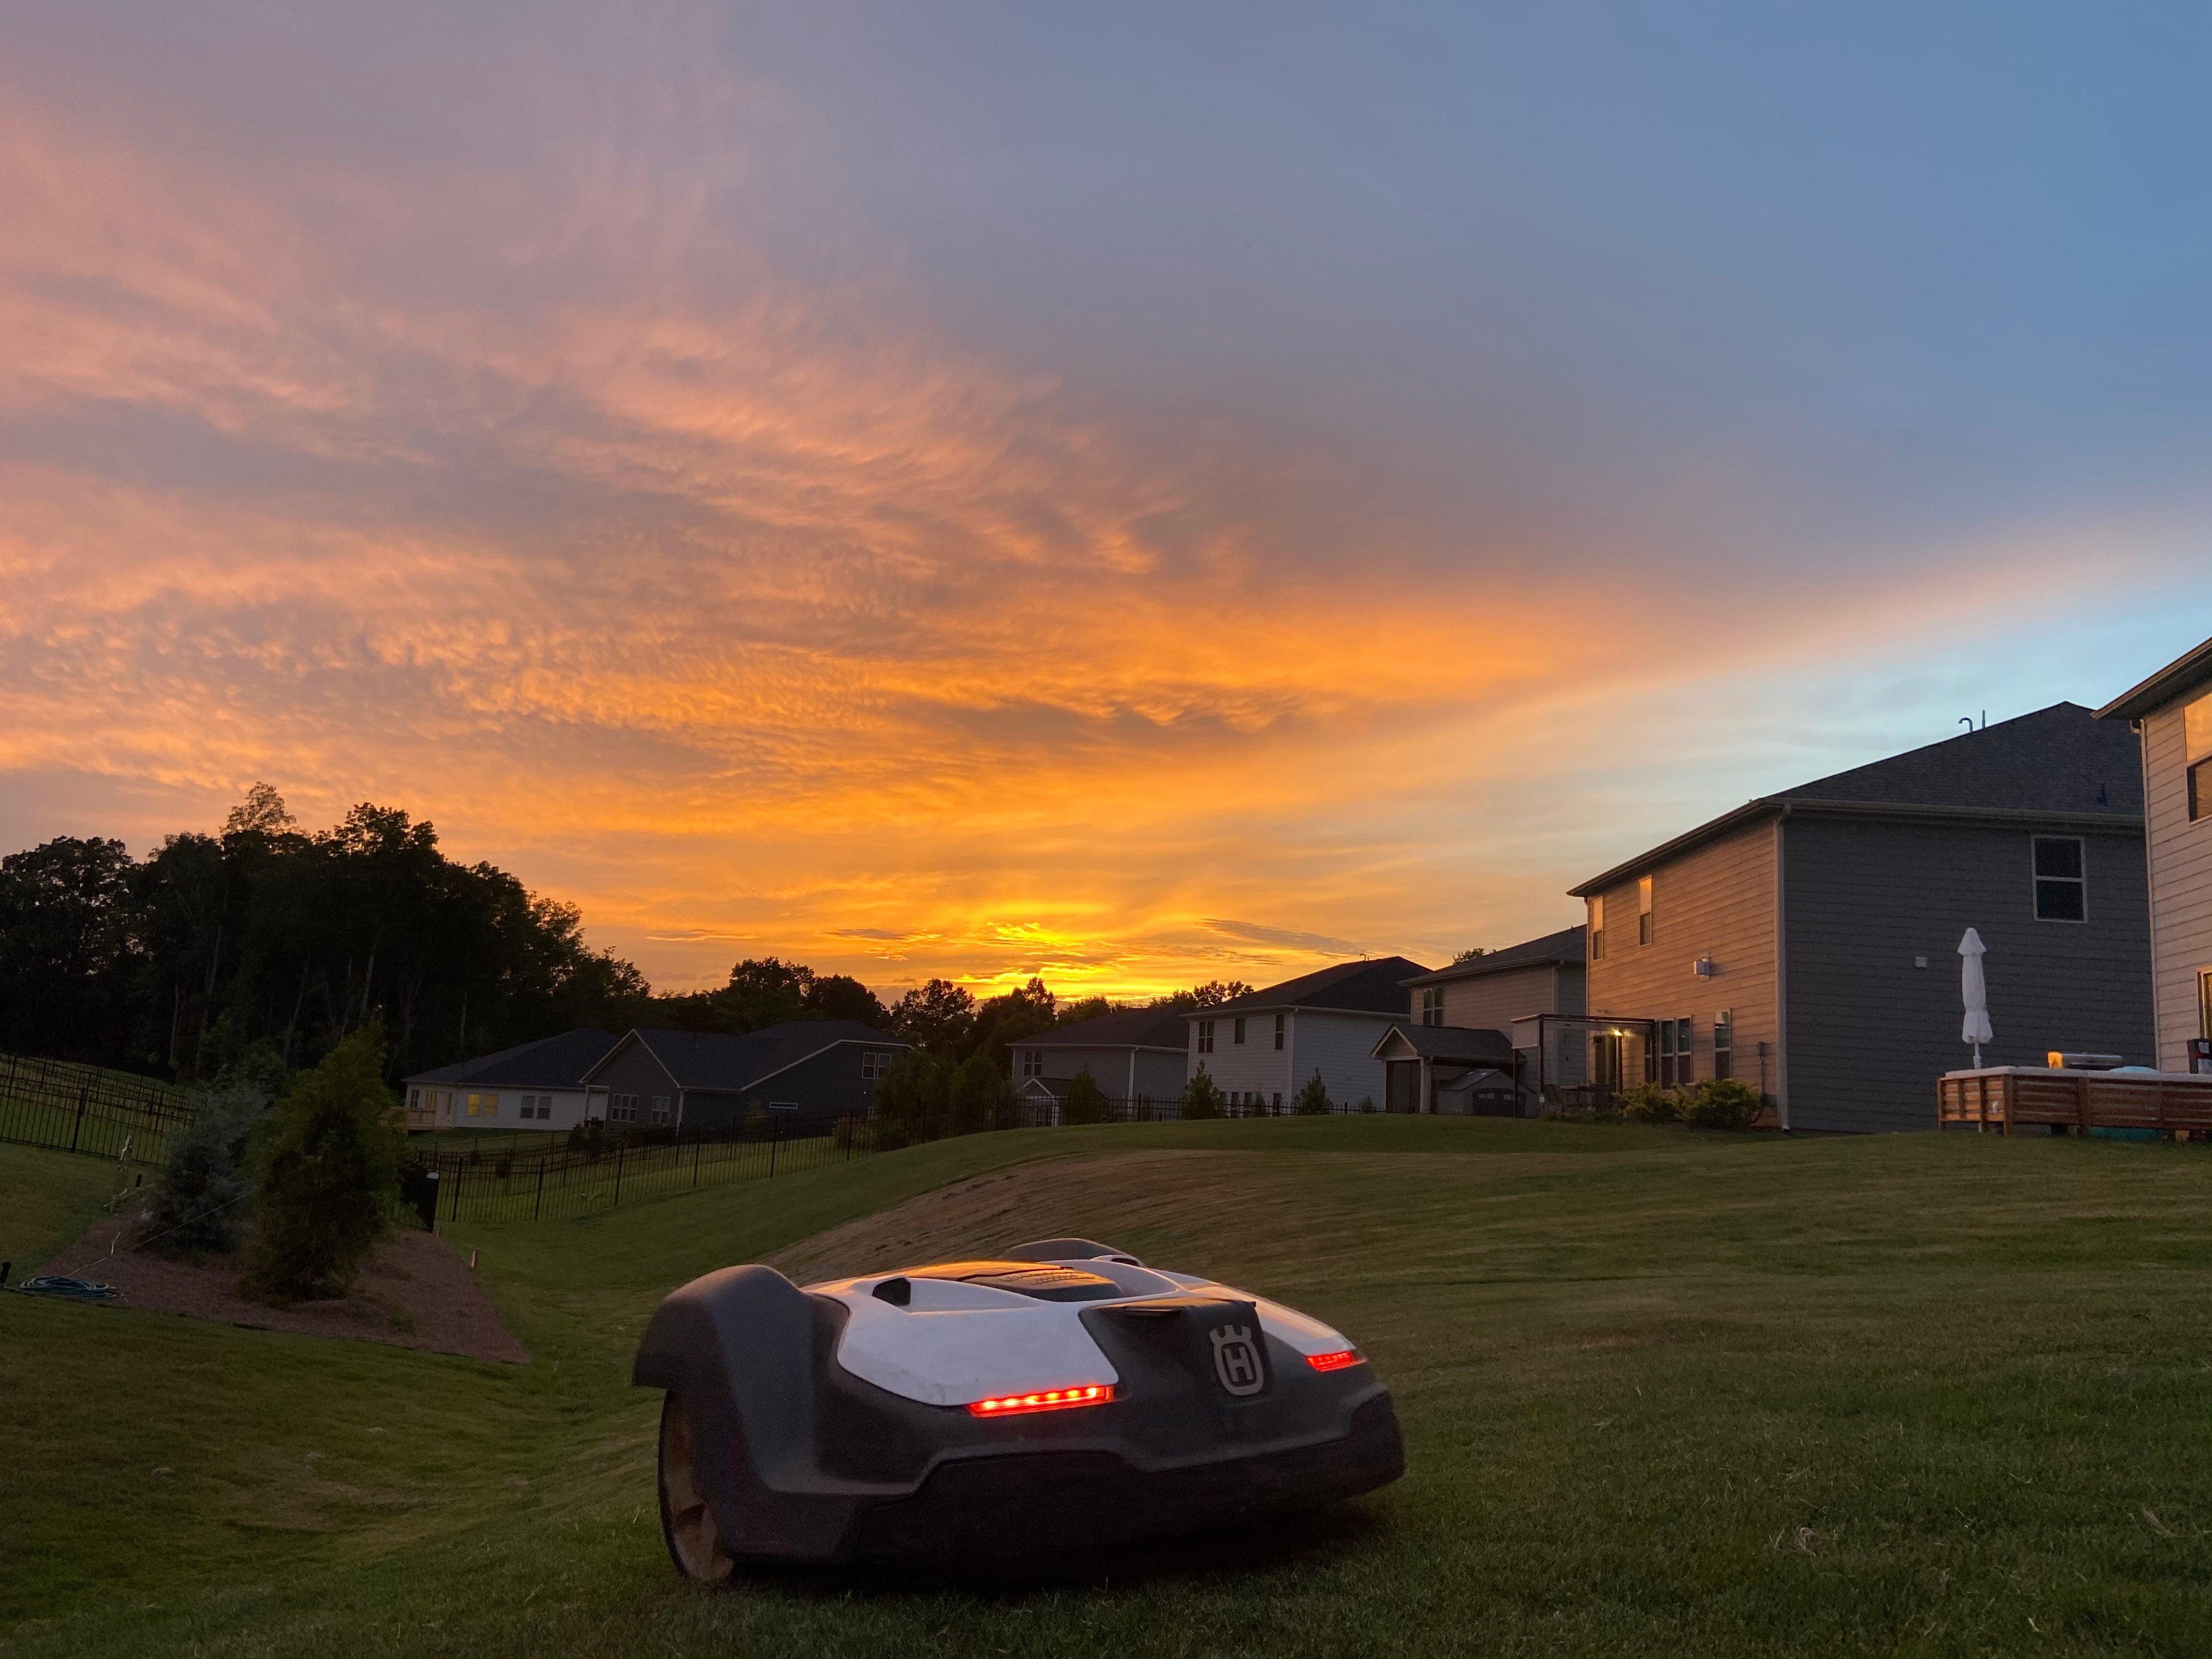 Automower at sunset